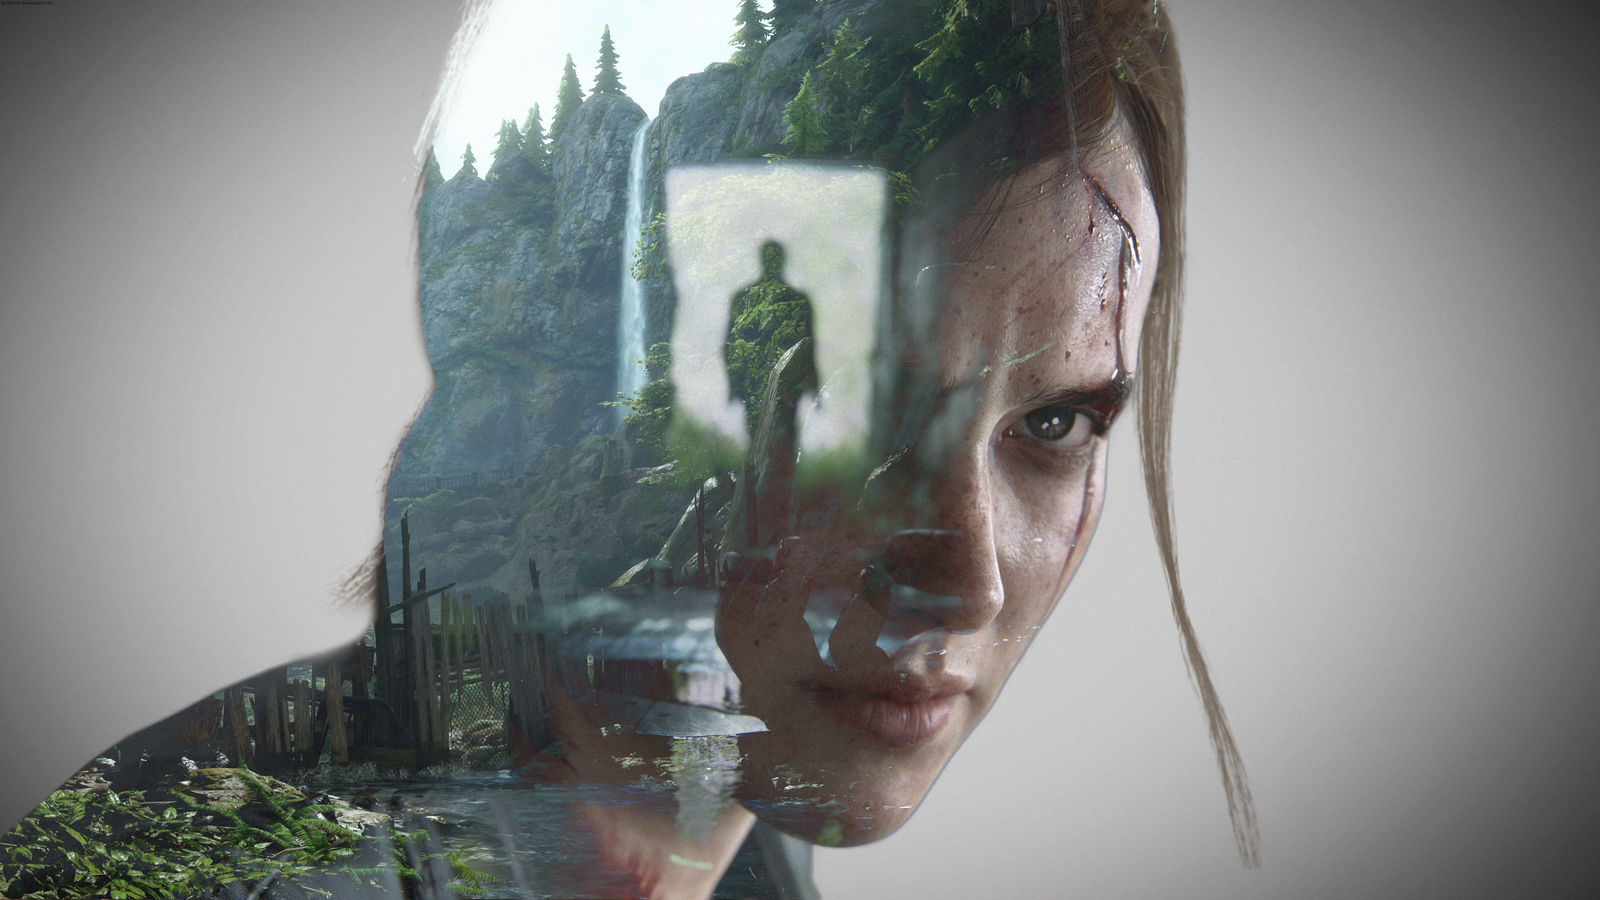 Last Of Us 2 Wallpapers Hd Desktop Mobile Backgrounds Pro